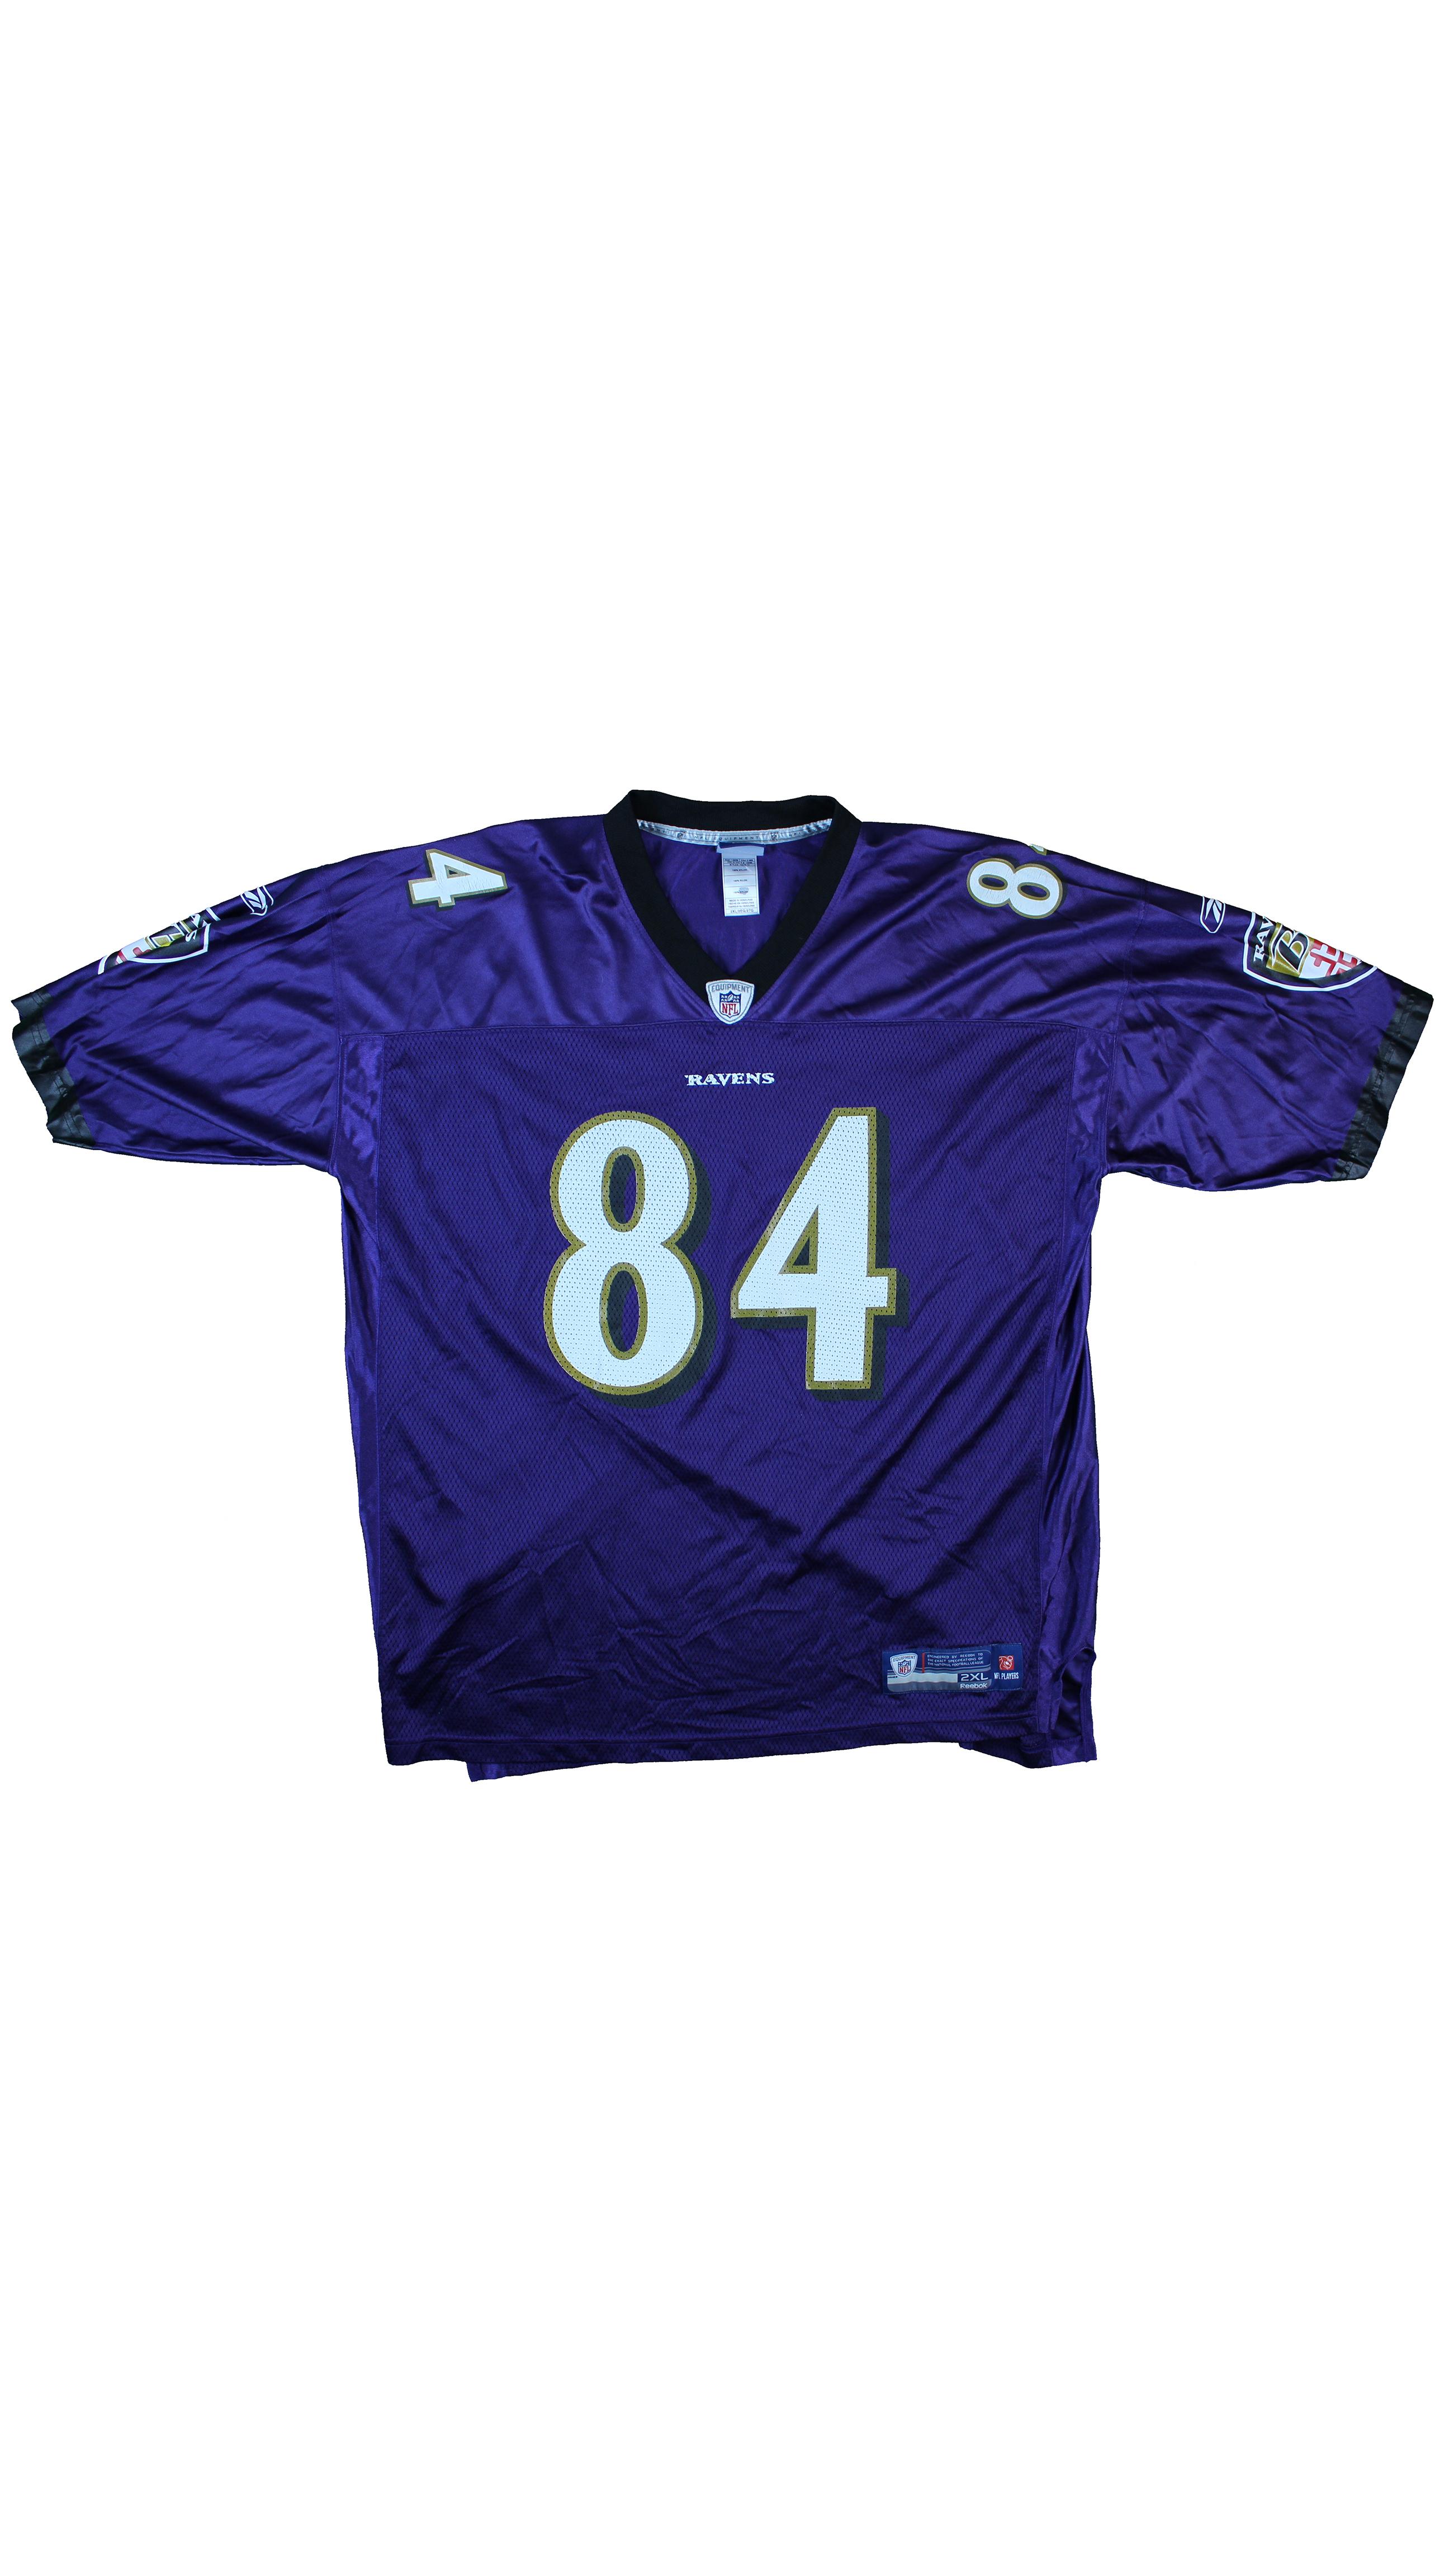 fef59728911 Vintage × Reebok × Nfl ×. Reebok x NFL Purple Oversized Ravens  Houshmandzadeh Football Jersey - XXL